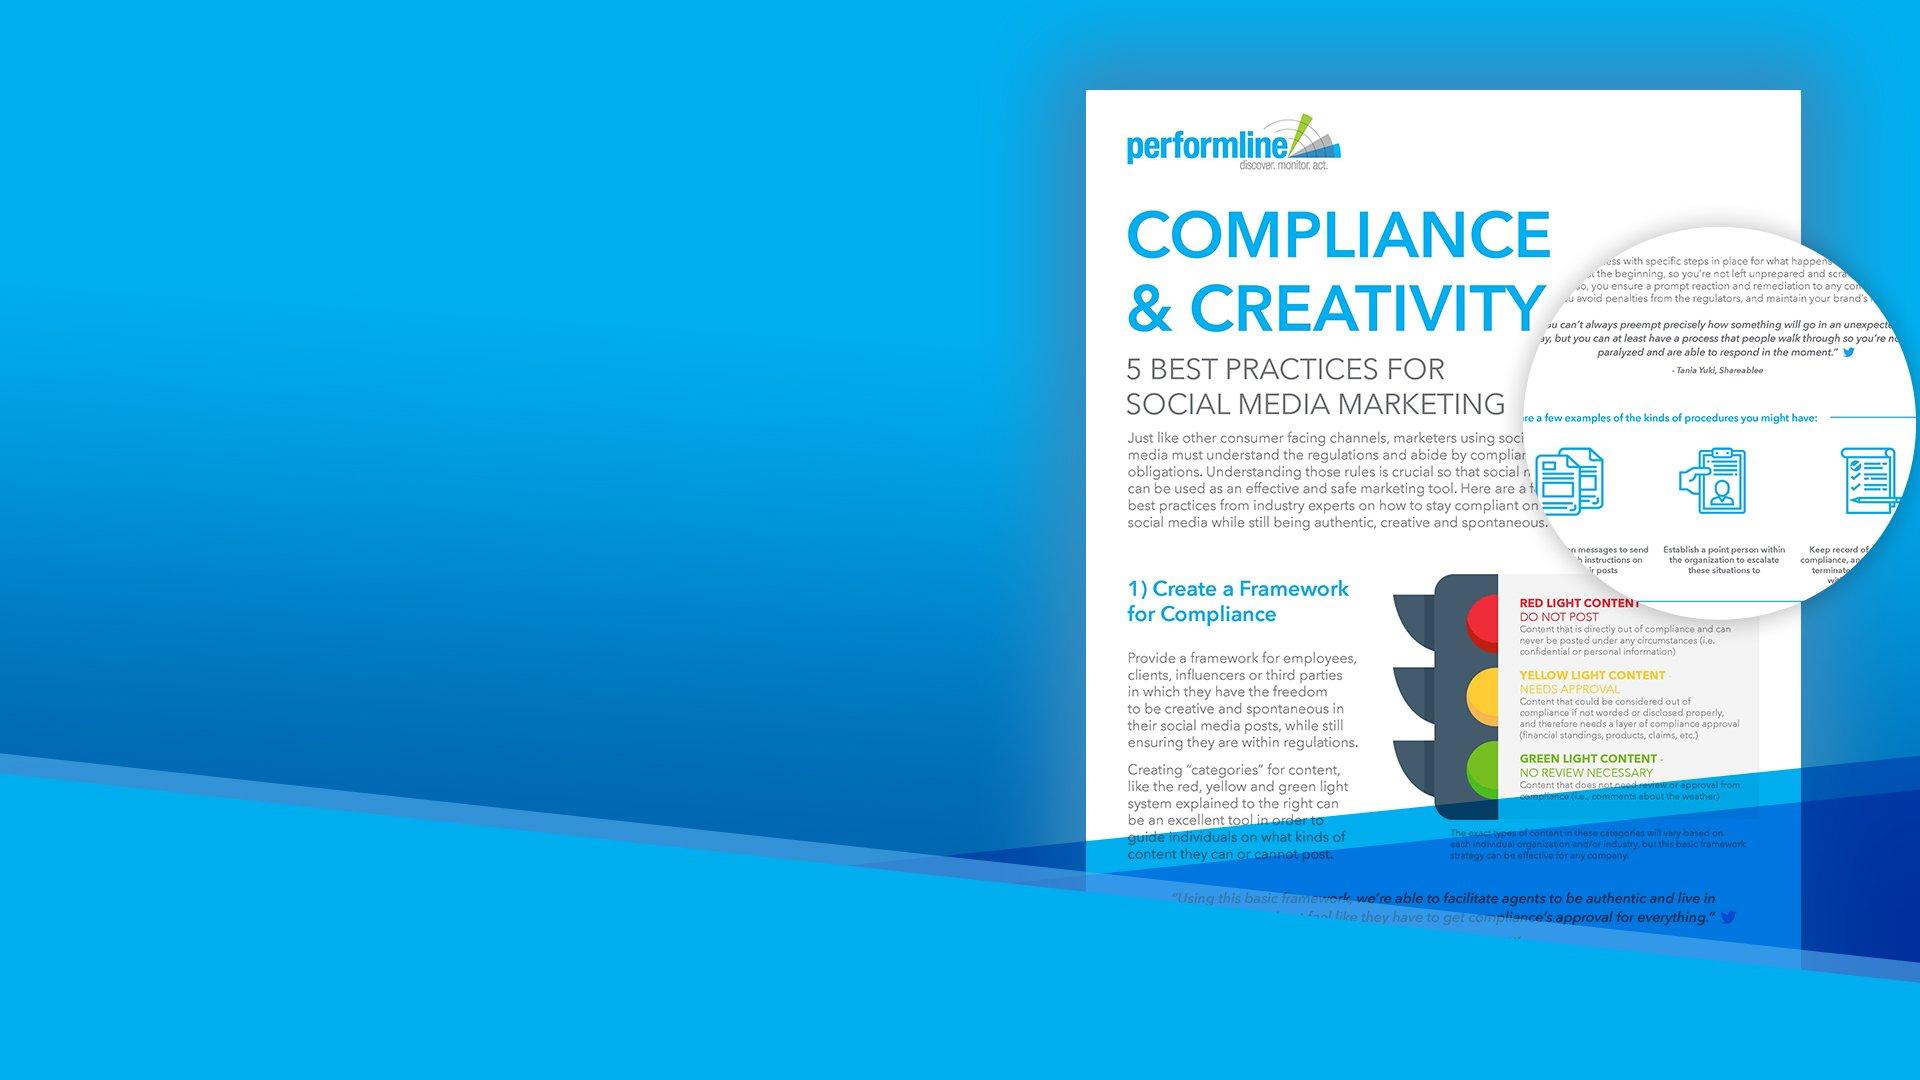 PerformLine-LP-compliance-social-media-best-pracitces-1